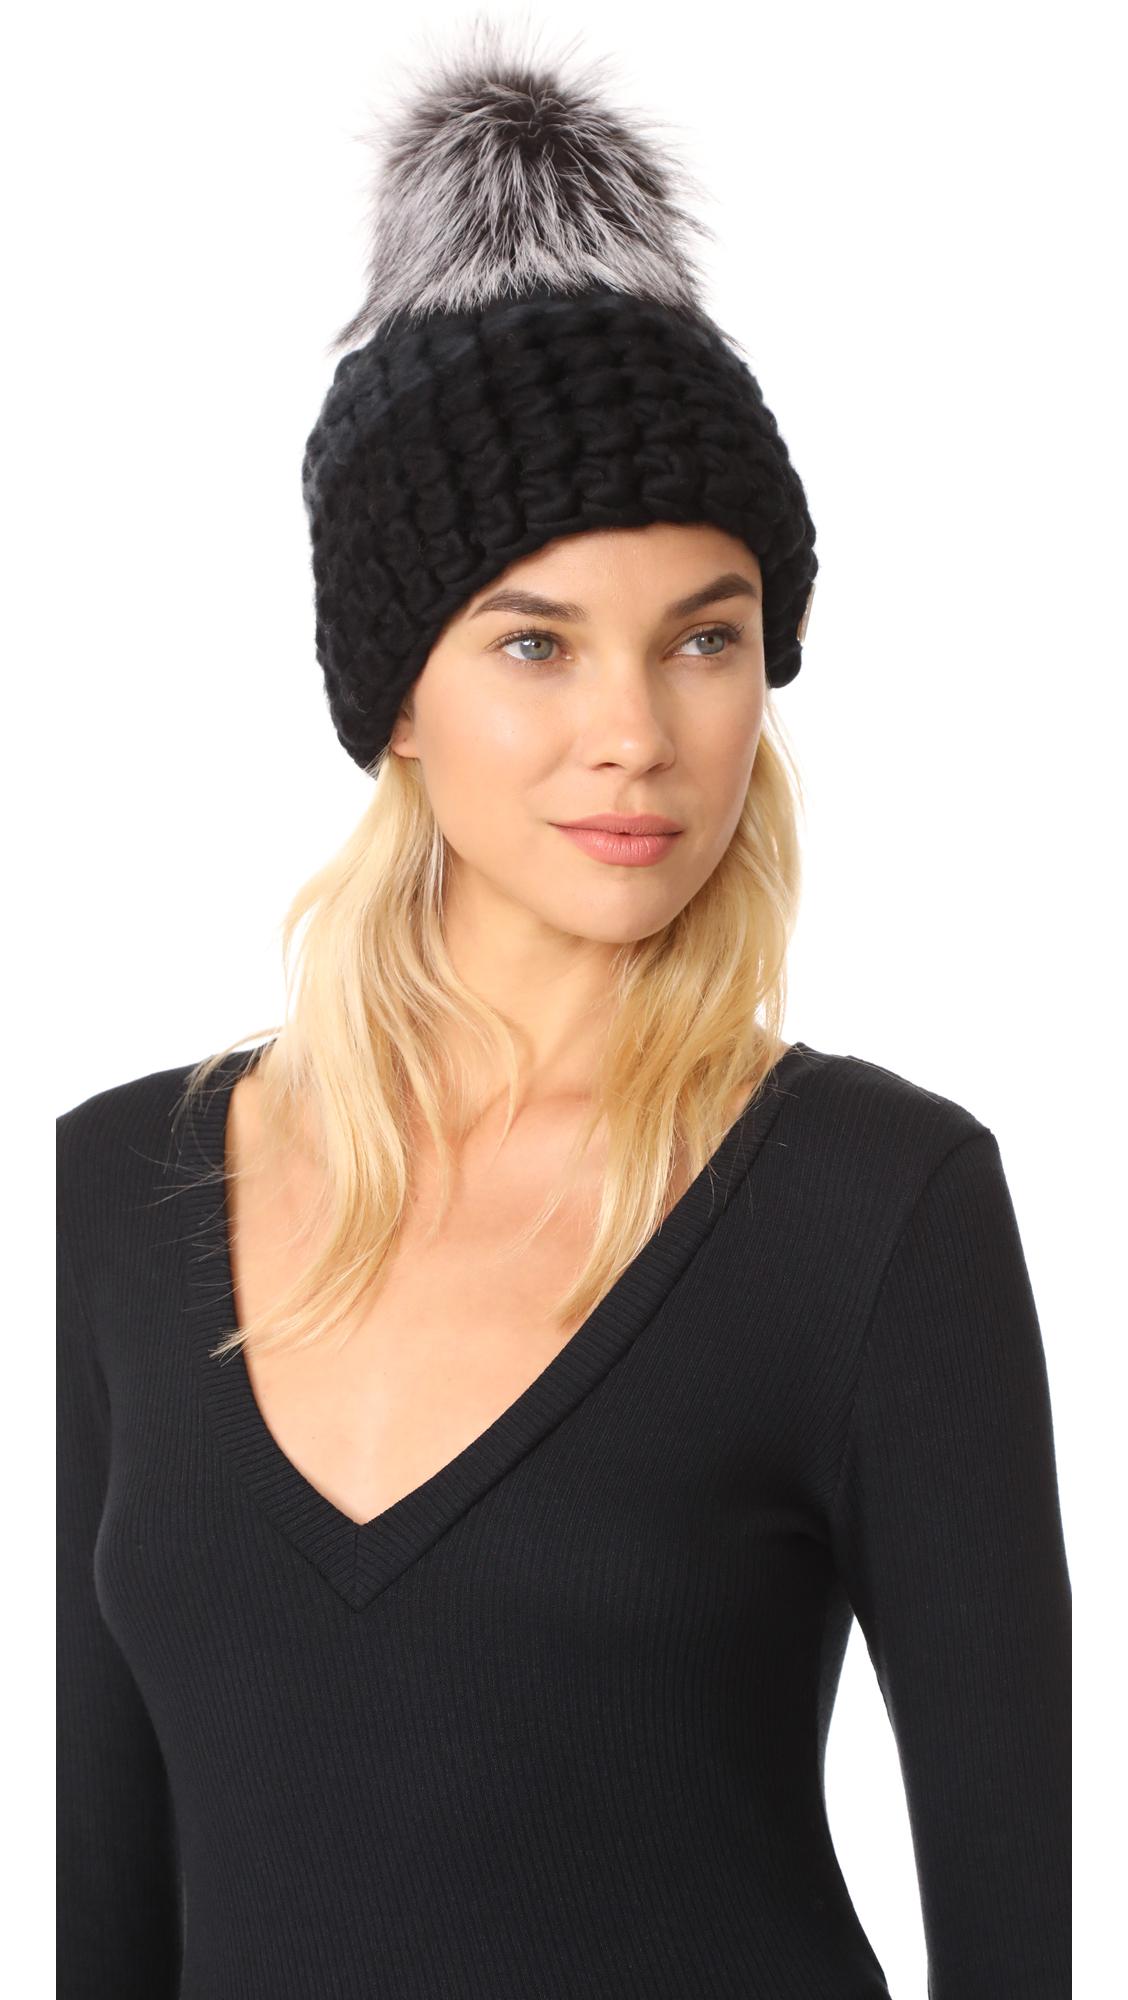 Mischa Lampert Deep Beanie Colorblock Hat - Dark Grey/Black/Silver Fox